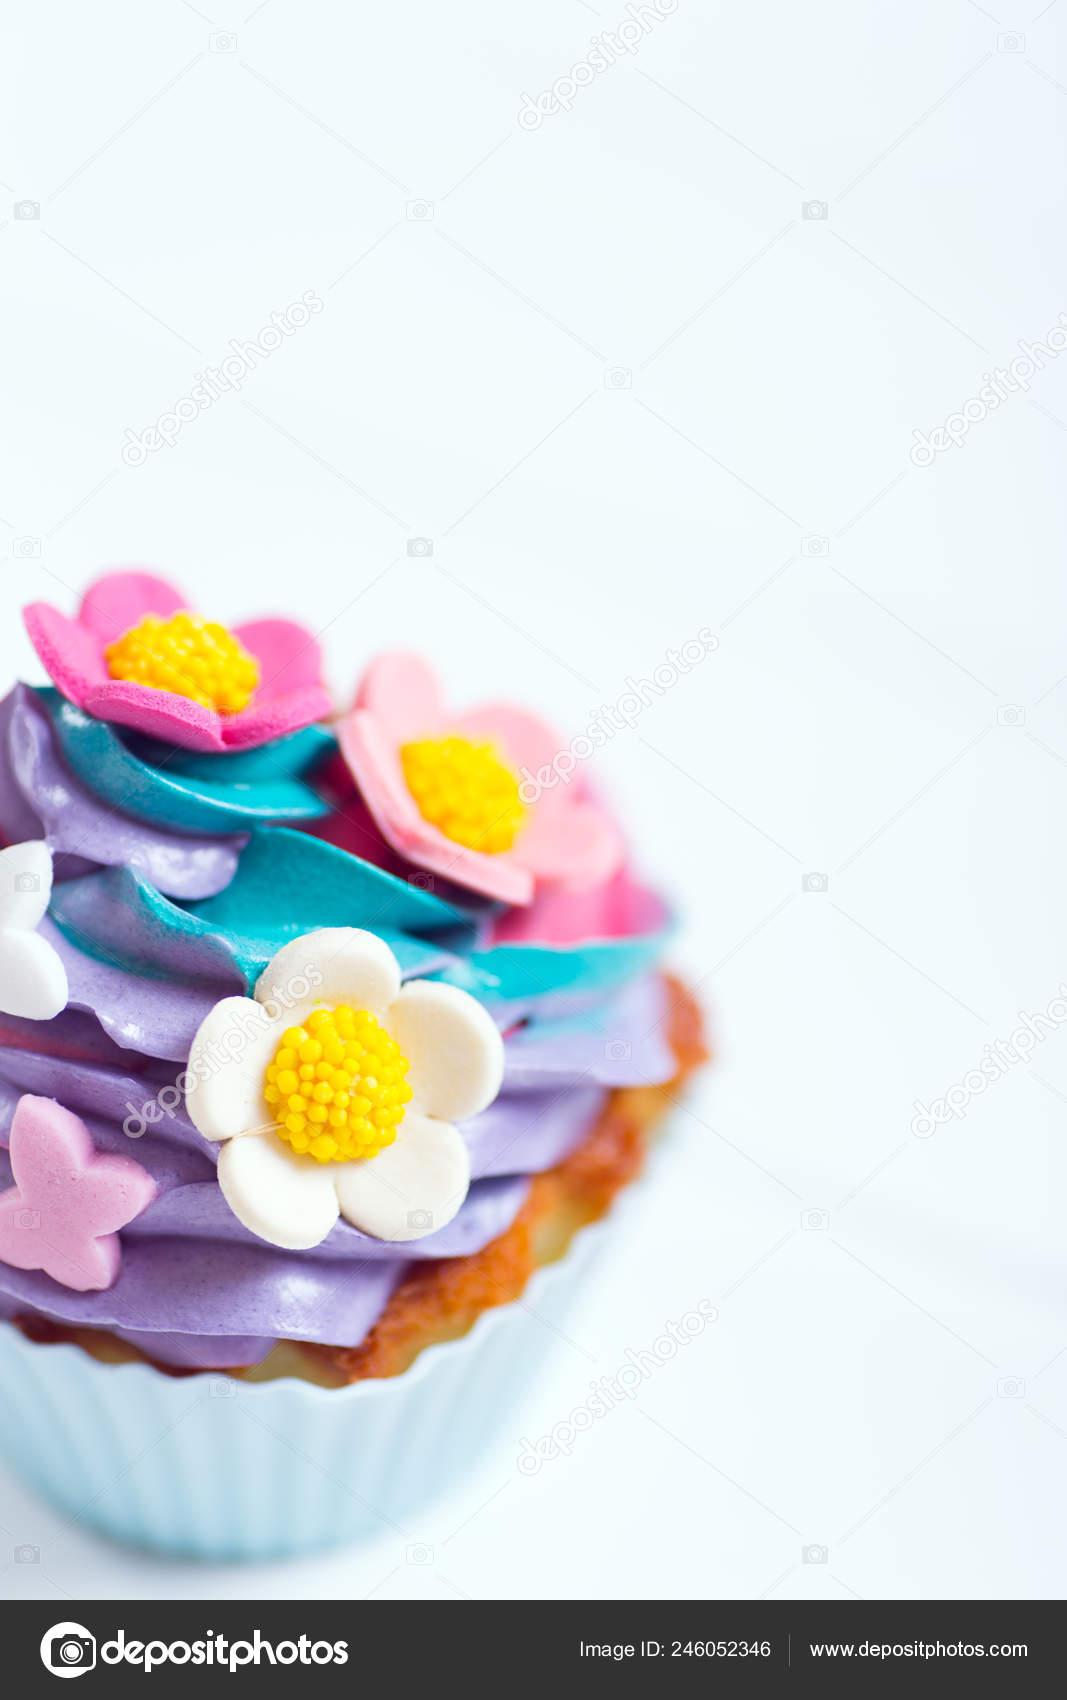 Closeup Queque Cremoso Multicolorido Topo Decorado Com